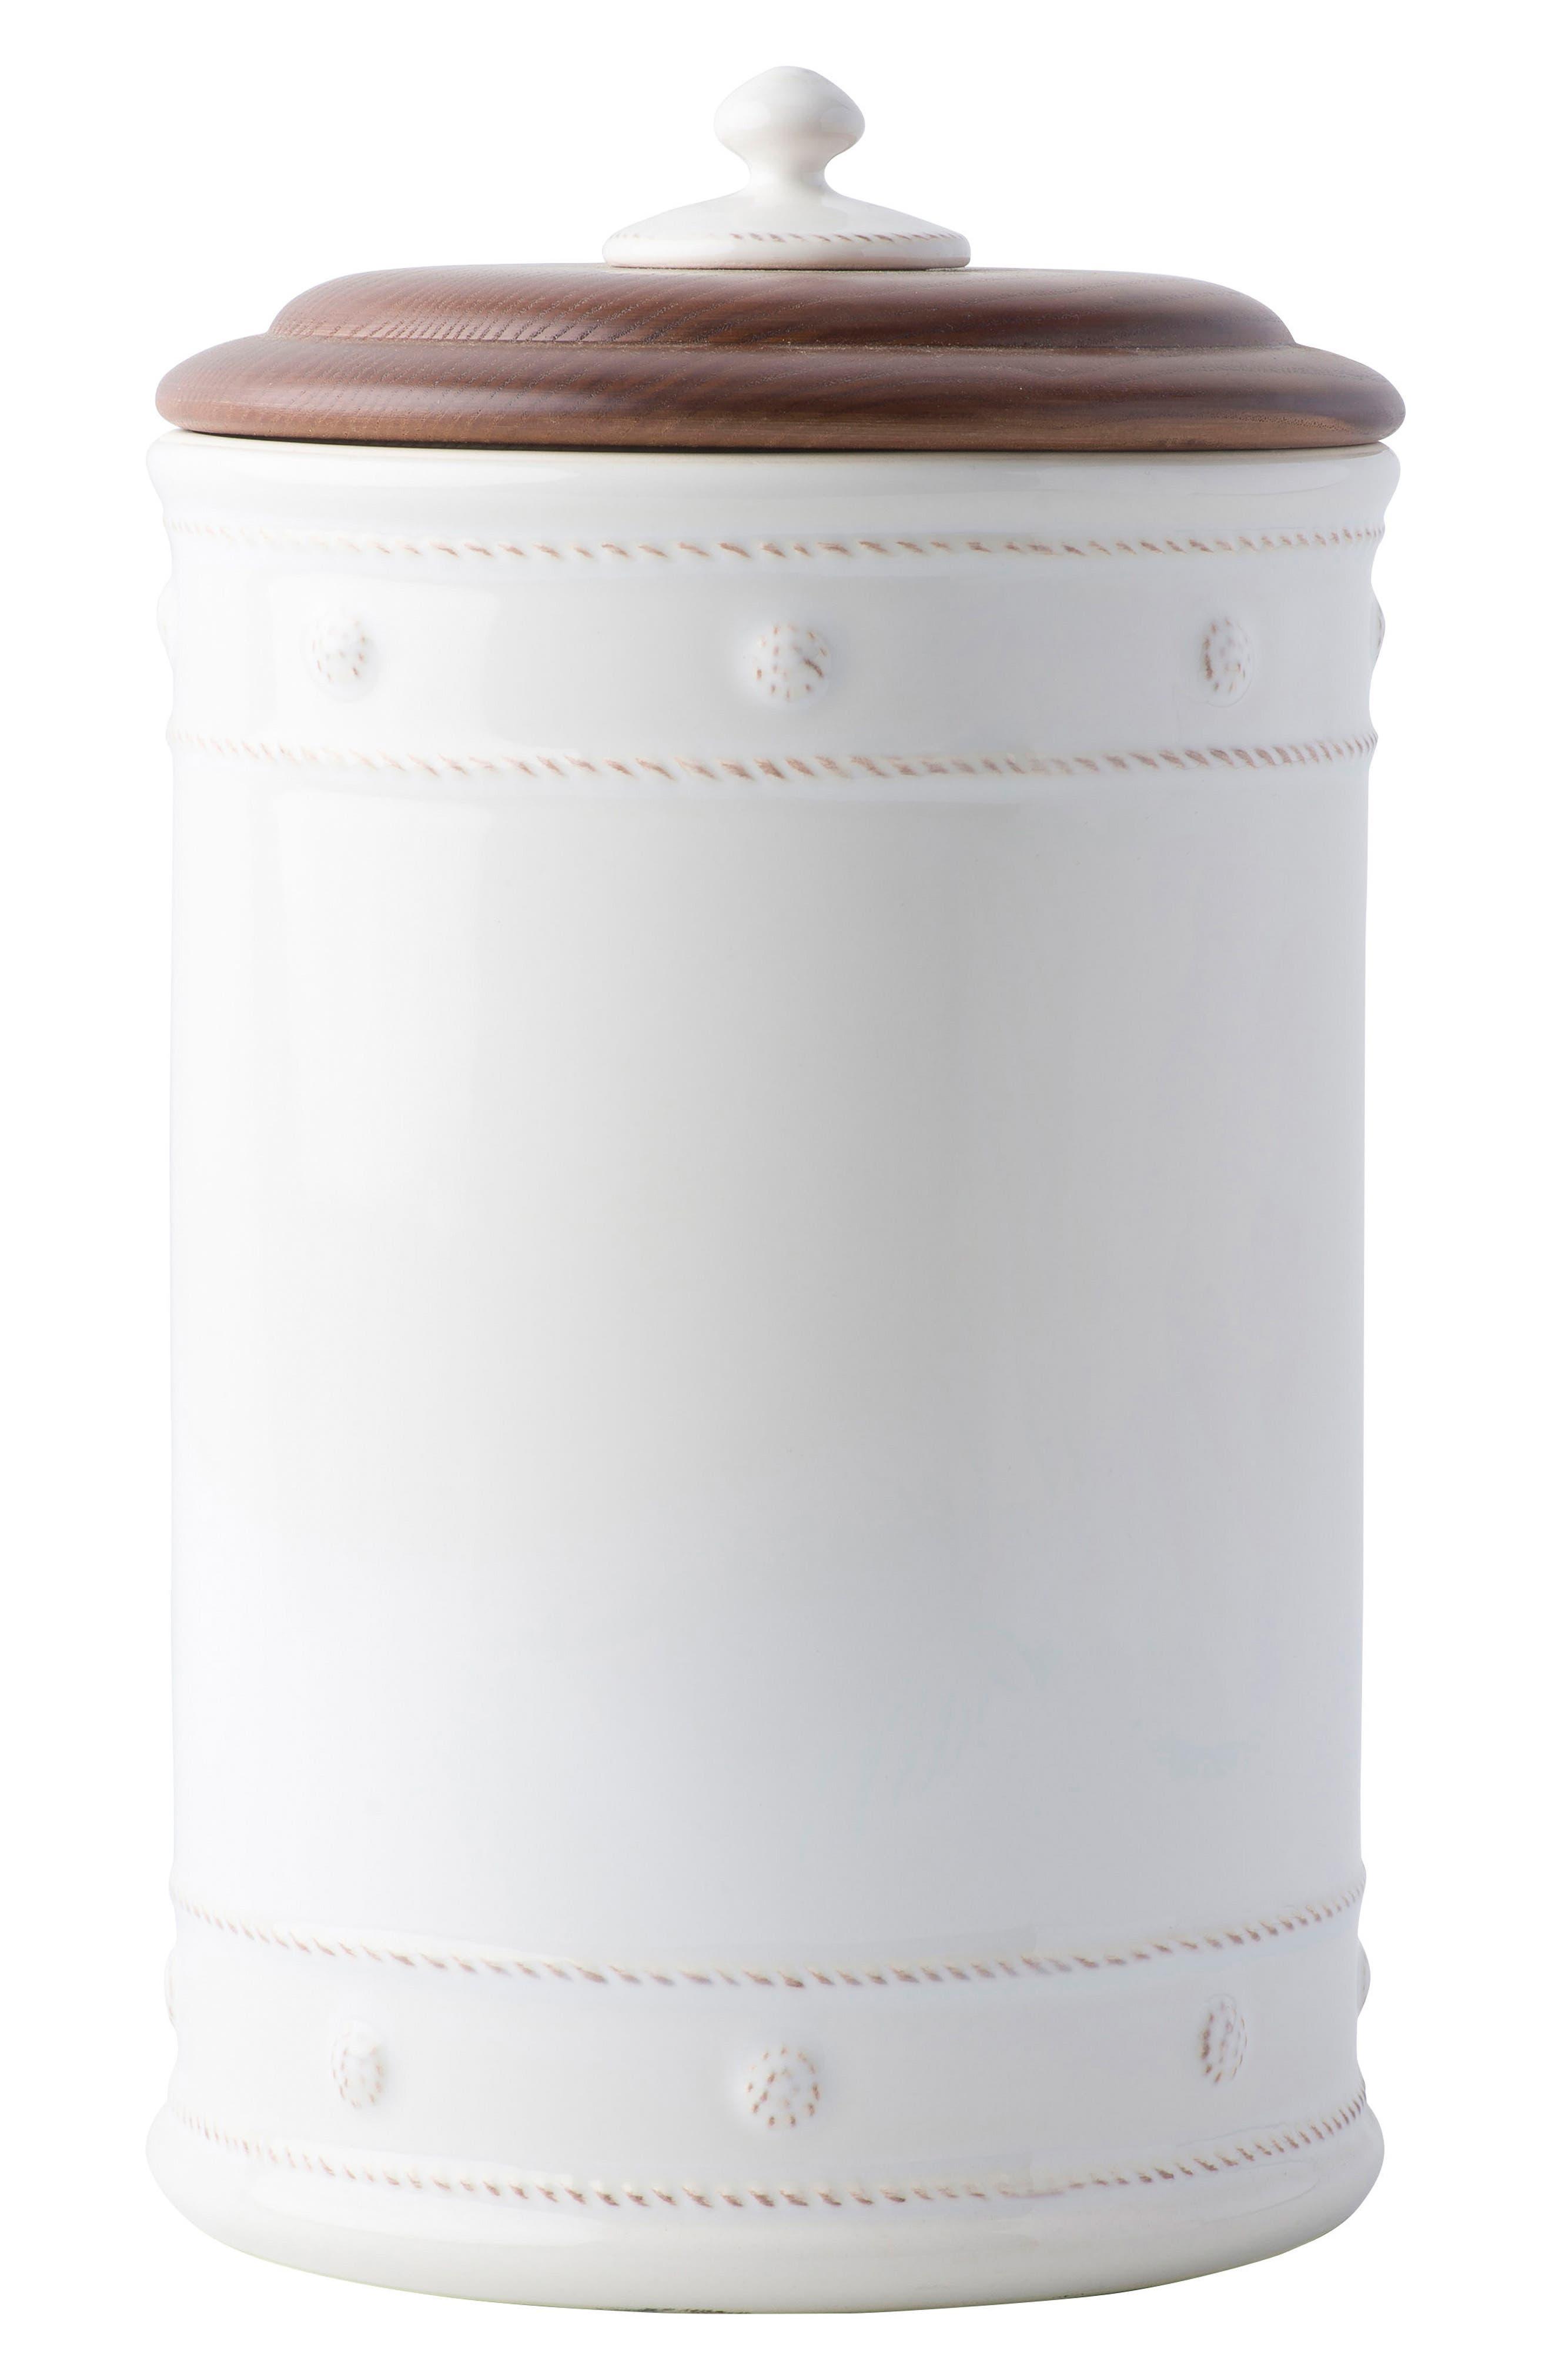 Berry & Thread Whitewash Ceramic Canister,                             Main thumbnail 1, color,                             WHITEWASH